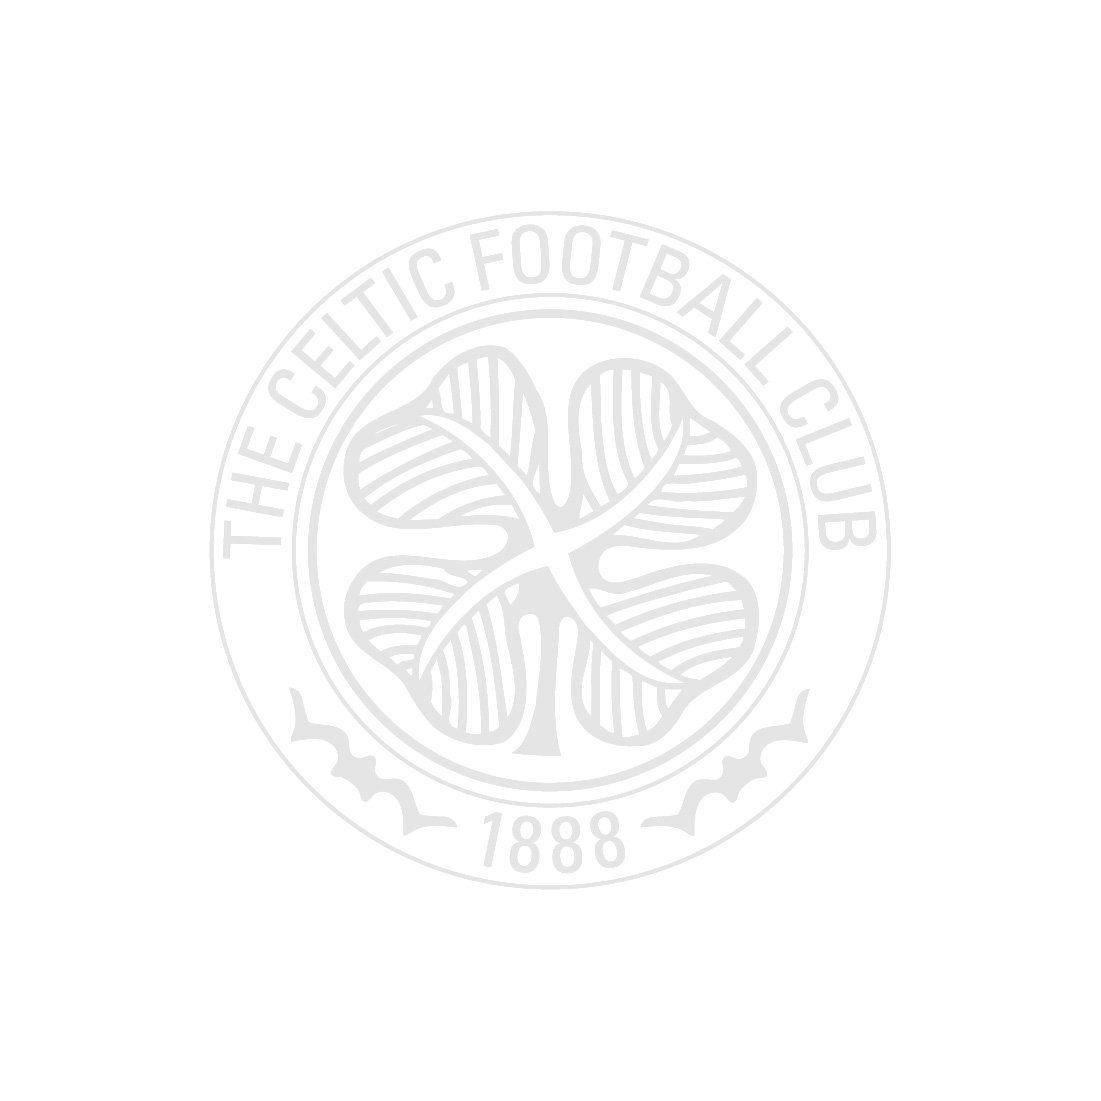 Celtic Broken Wall Mural & Sticker Set